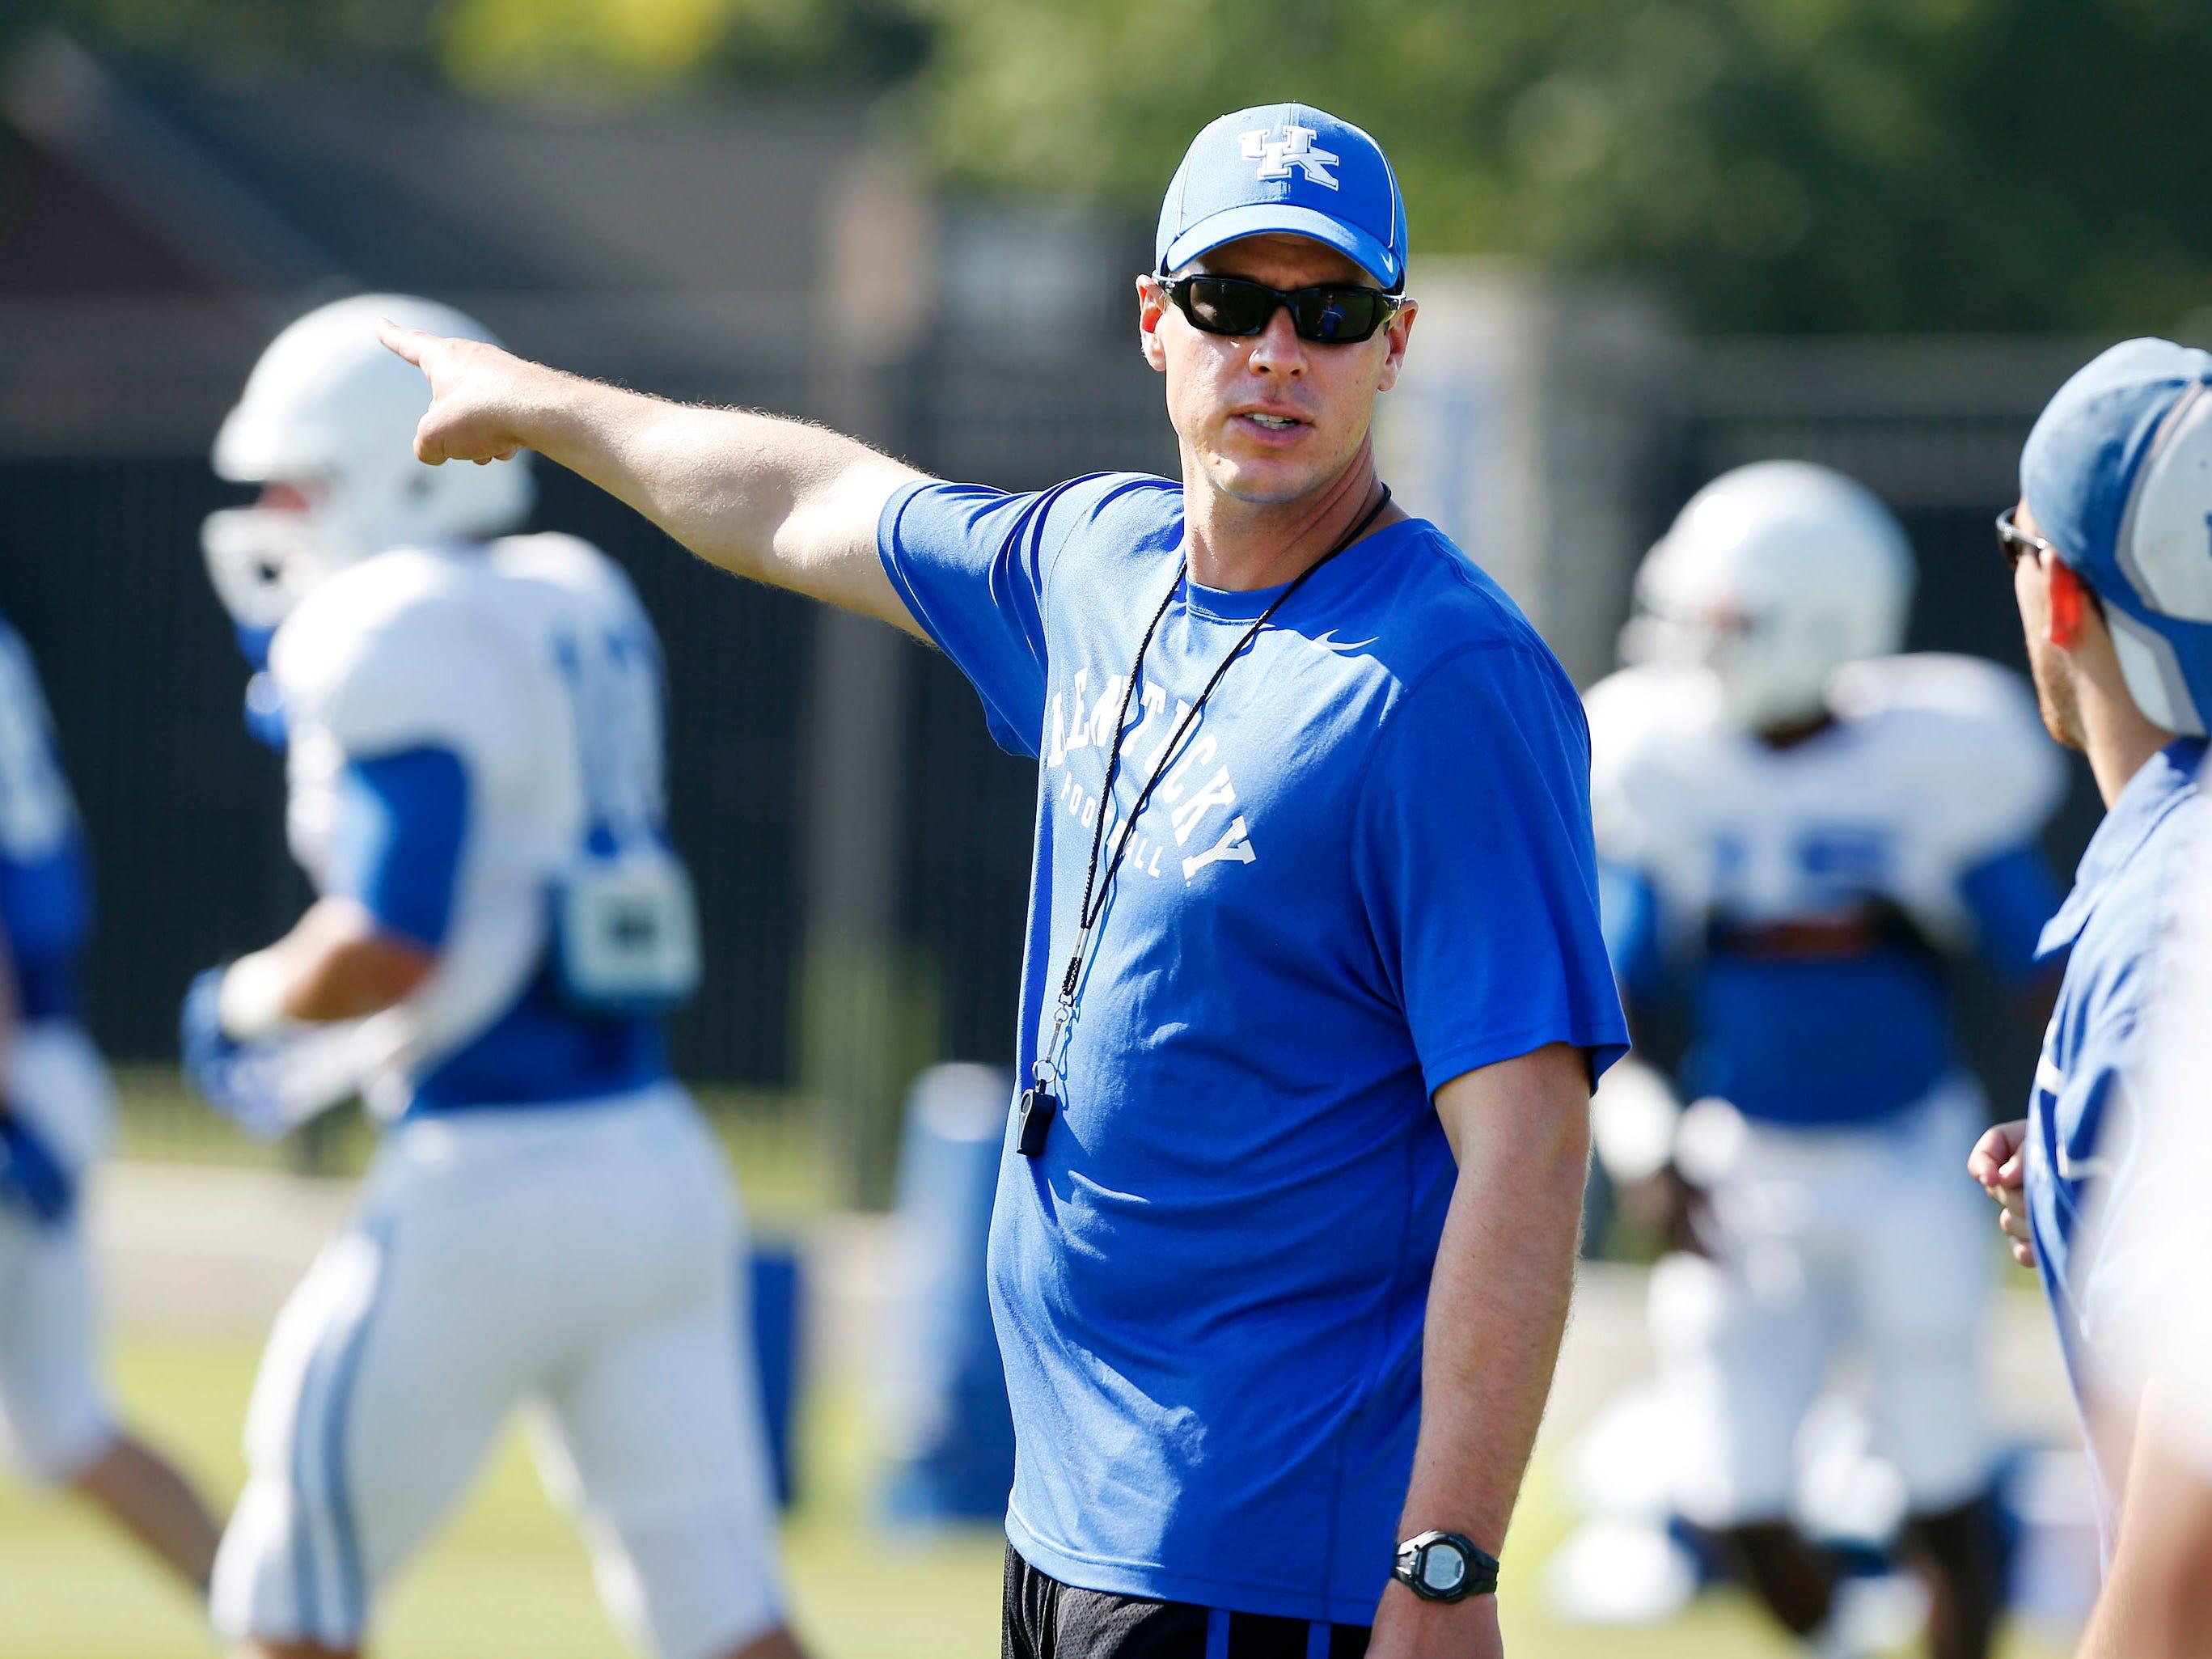 Defensive coordinator/linebackers coach D.J. Eliot gave instruction during Kentucky football practice in Lexington, Ky. Aug. 24, 2013